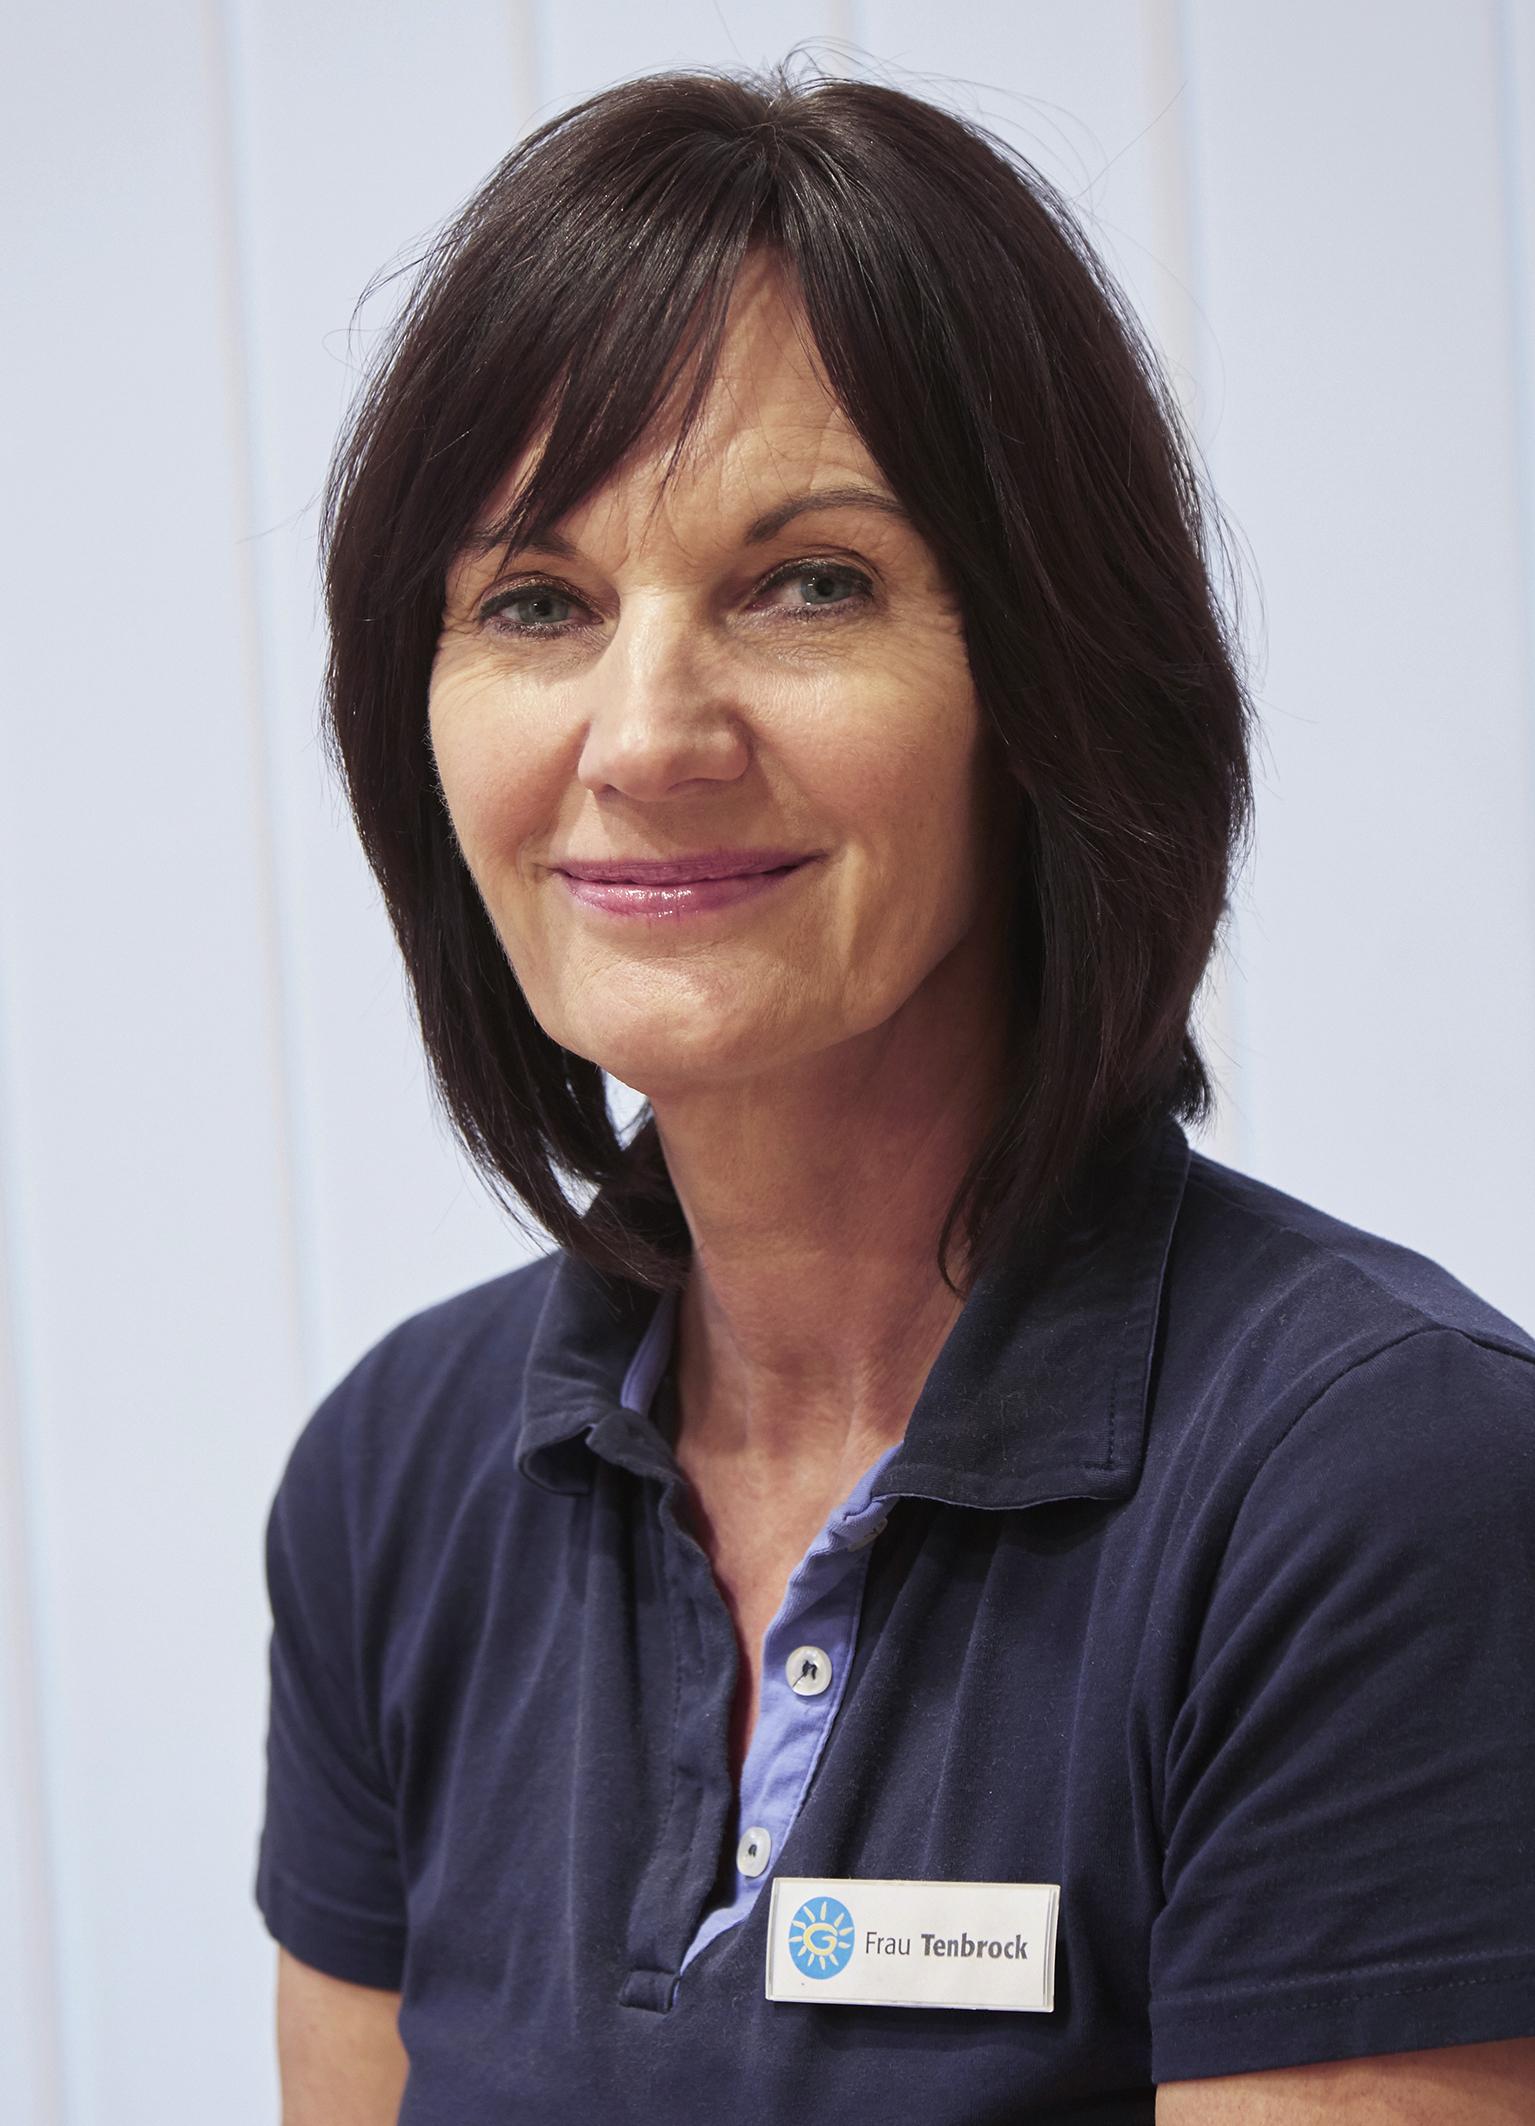 Frau Tenbrock